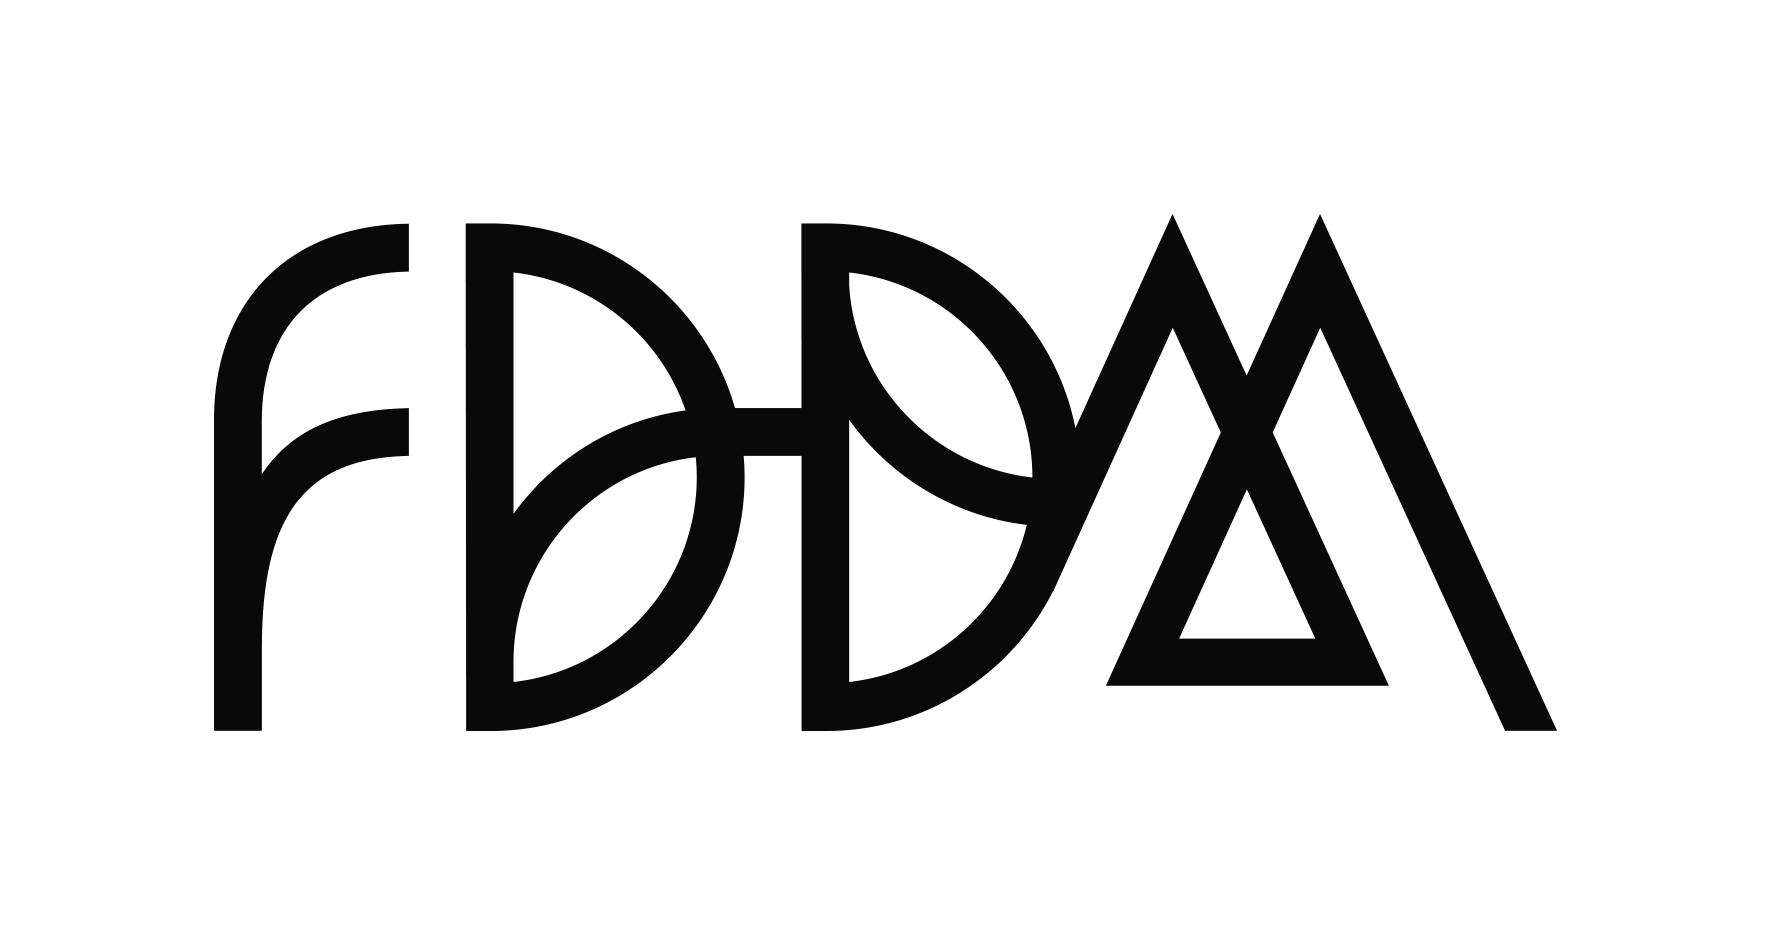 Logo FDDM